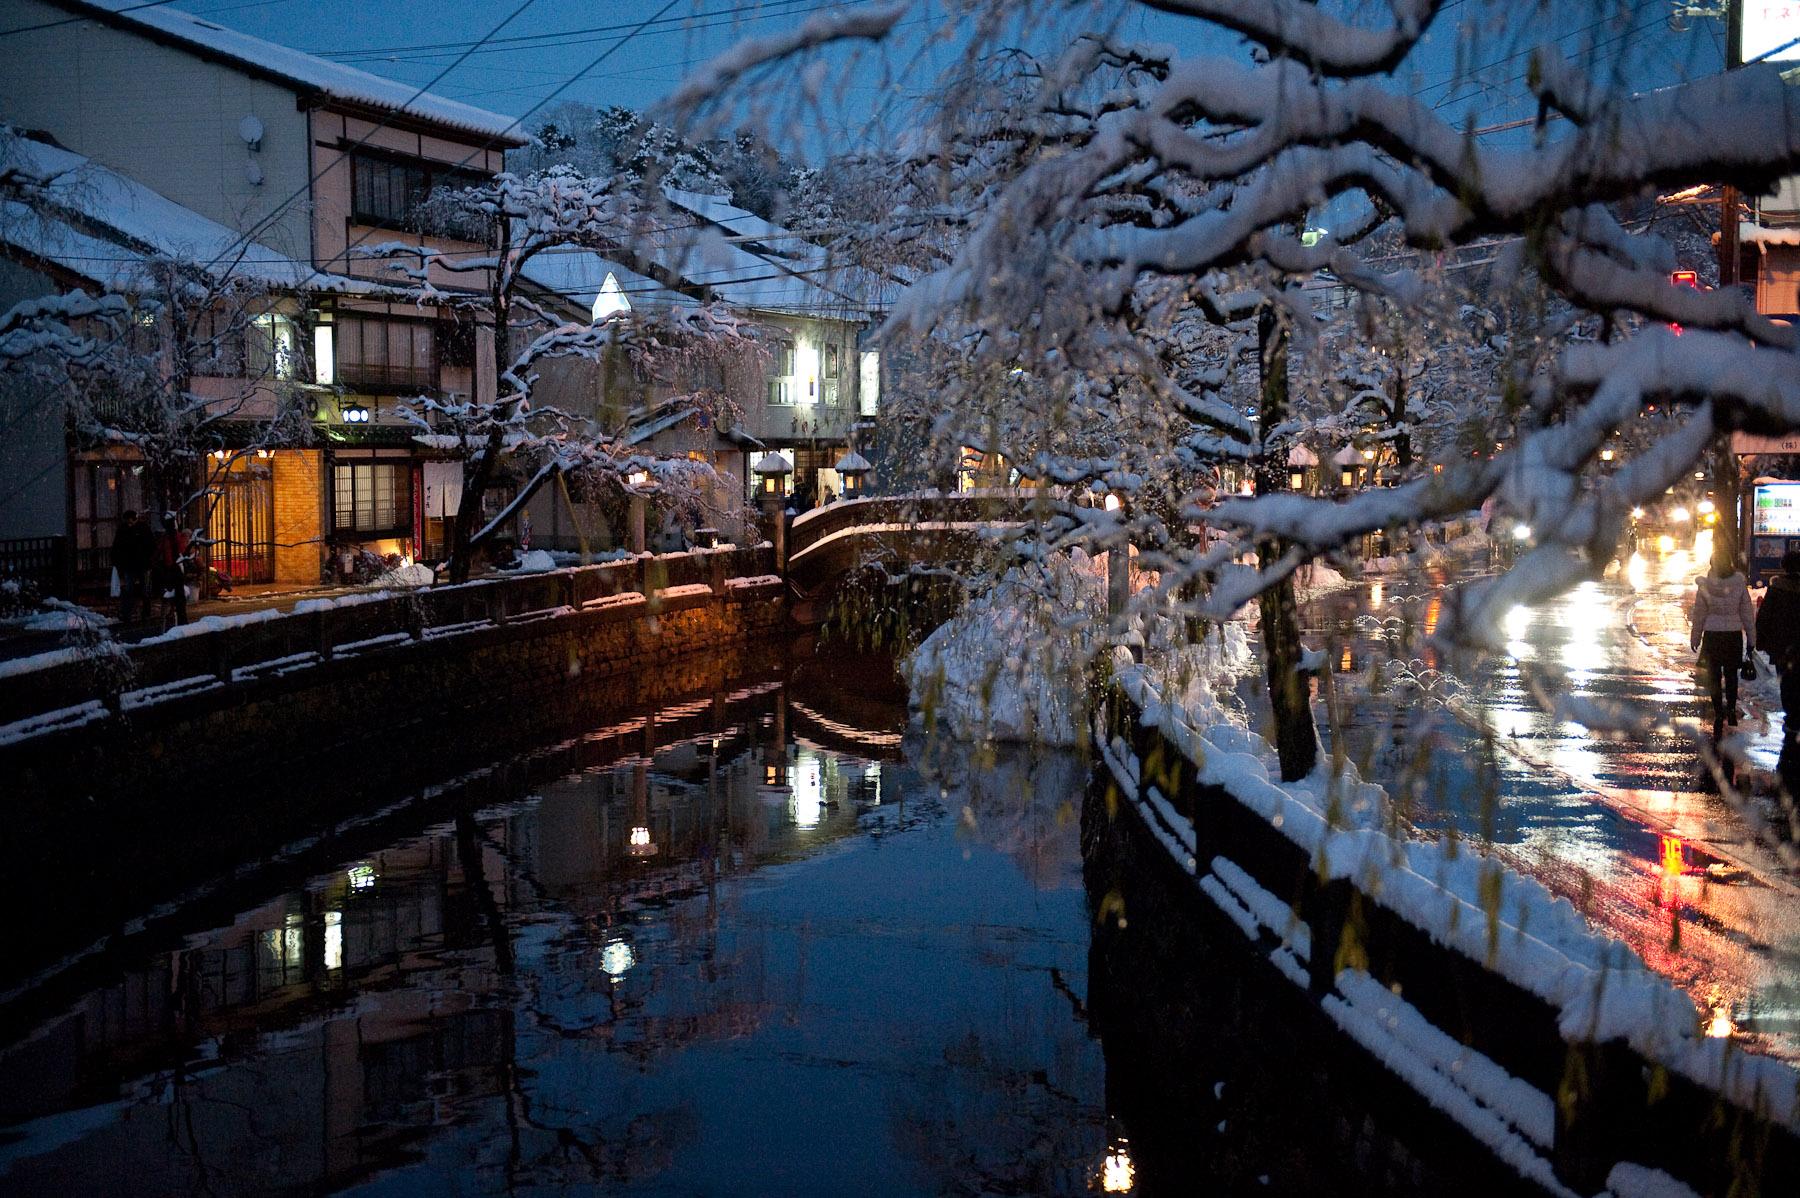 Japan Fall Wallpaper Jeffrey Friedl S Blog 187 Cold Wet And Slippery In Kinosaki